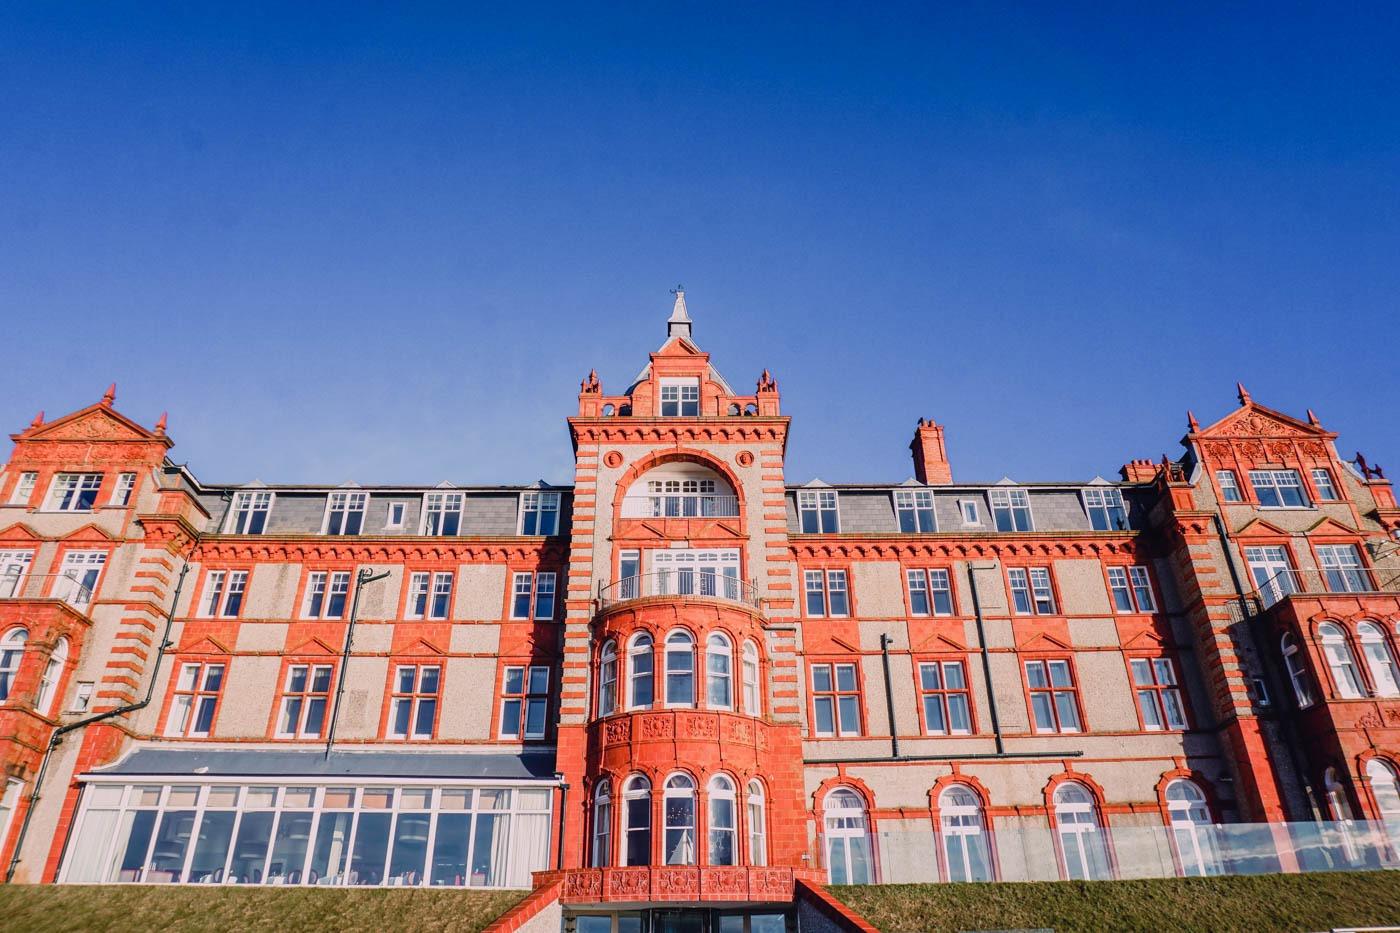 The Headland Hotel - Cornwall #luxury #england